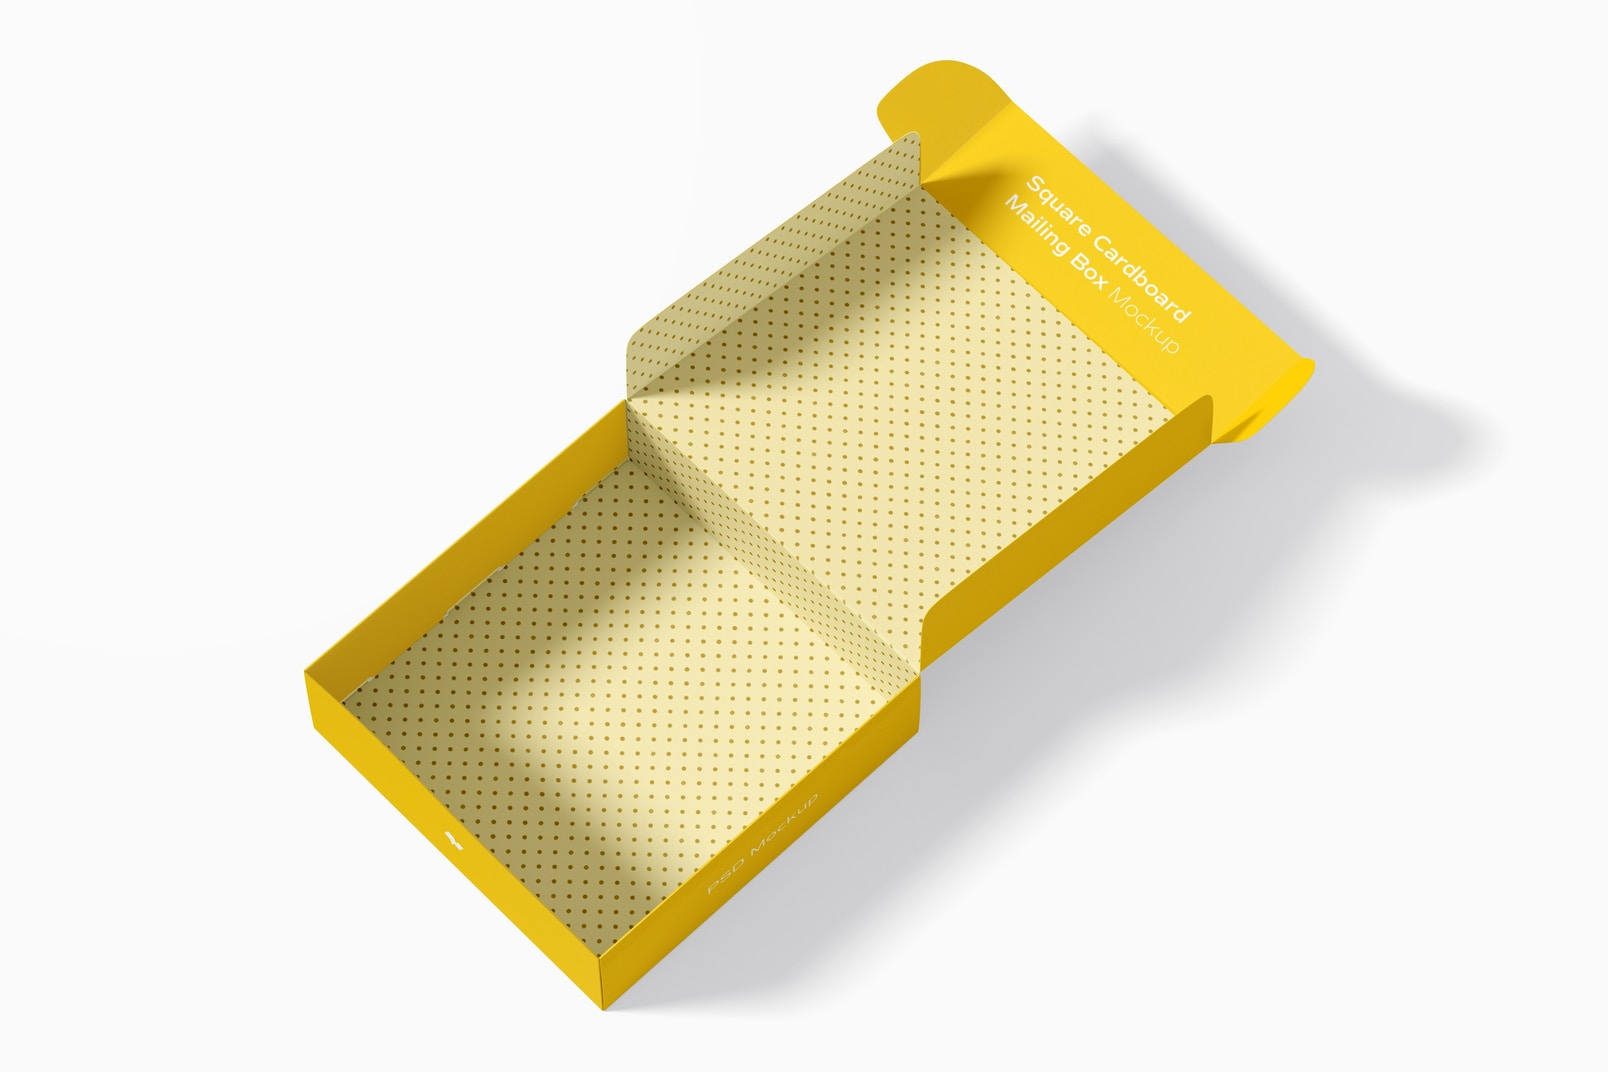 Square Cardboard Mailing Box Mockup, Opened